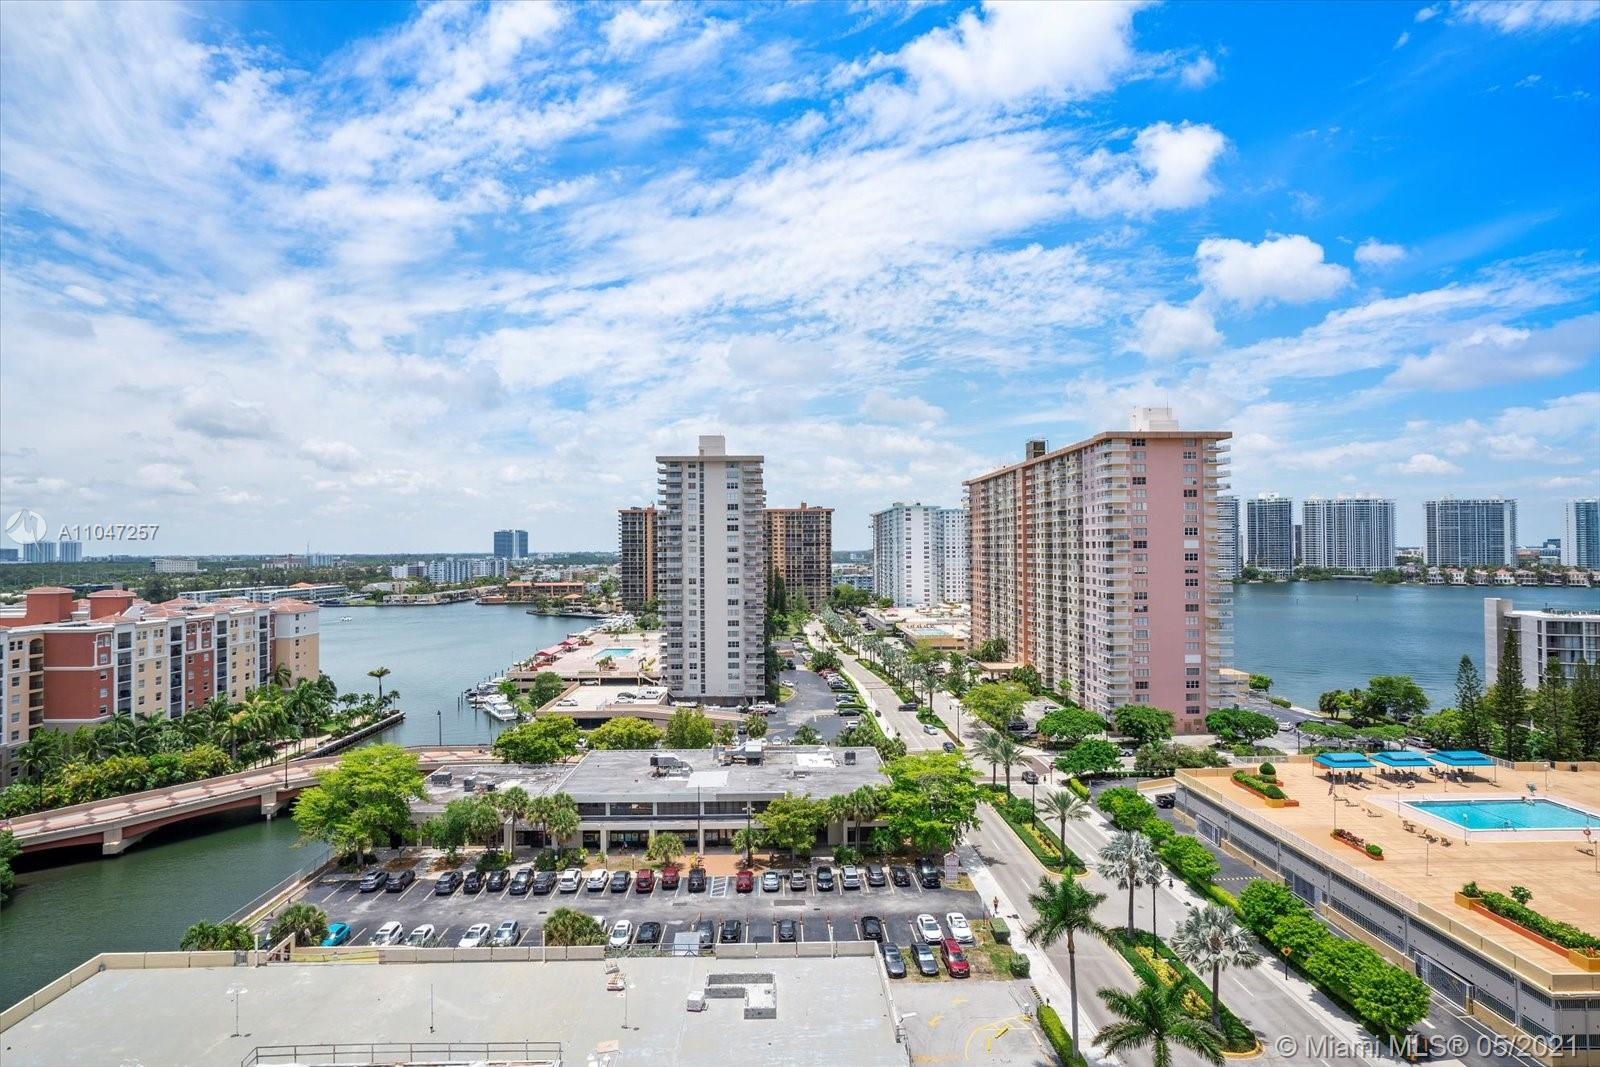 Winston Tower 300 #1612 - 230 174th St #1612, Sunny Isles Beach, FL 33160